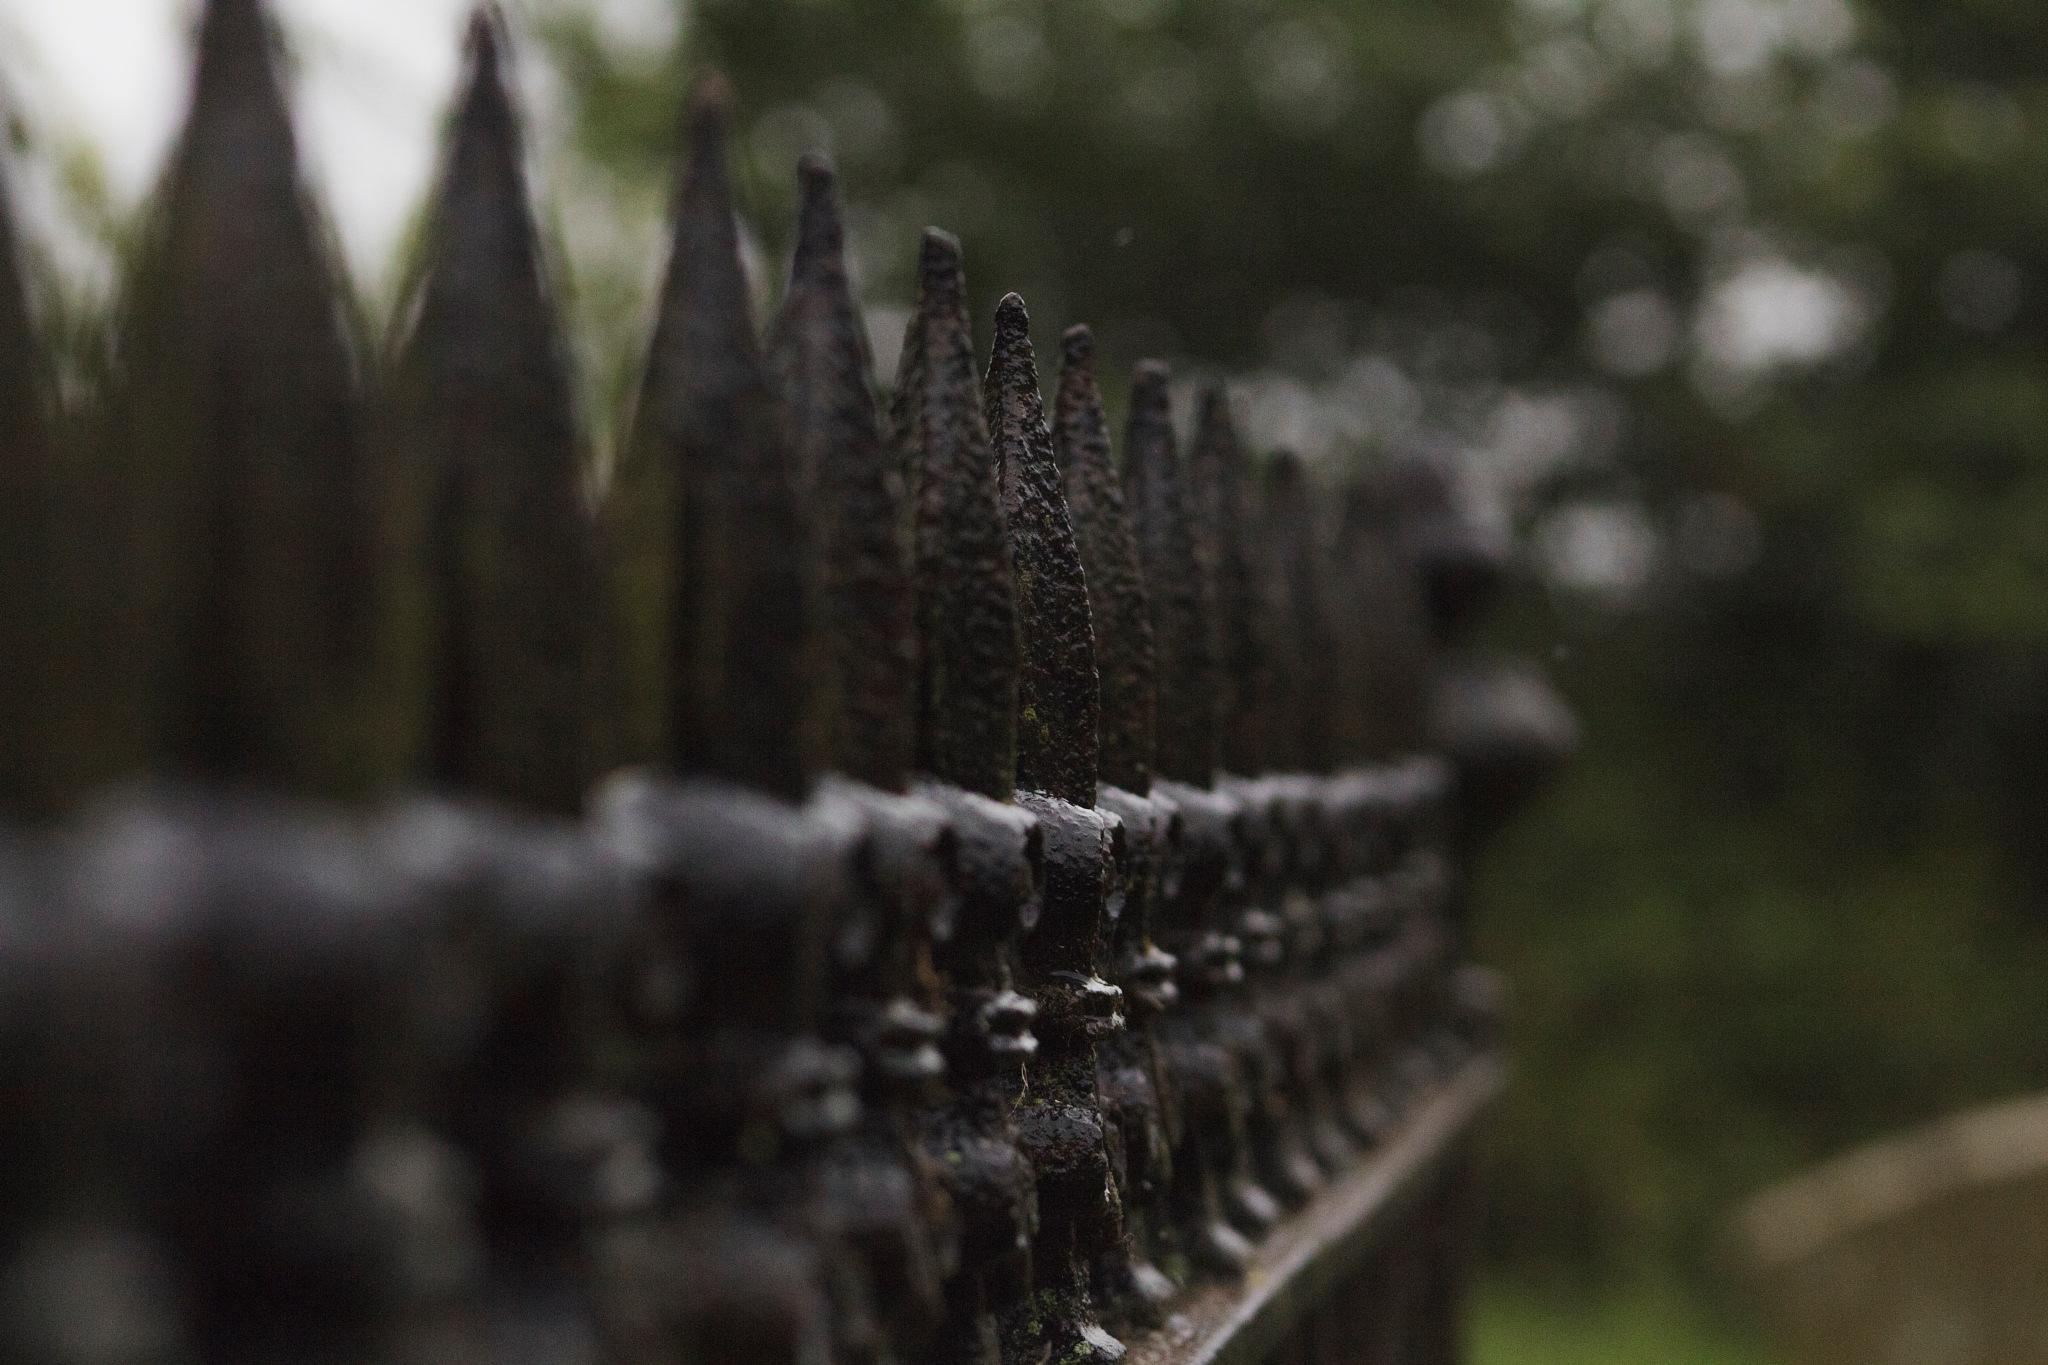 railings by johnilling1969